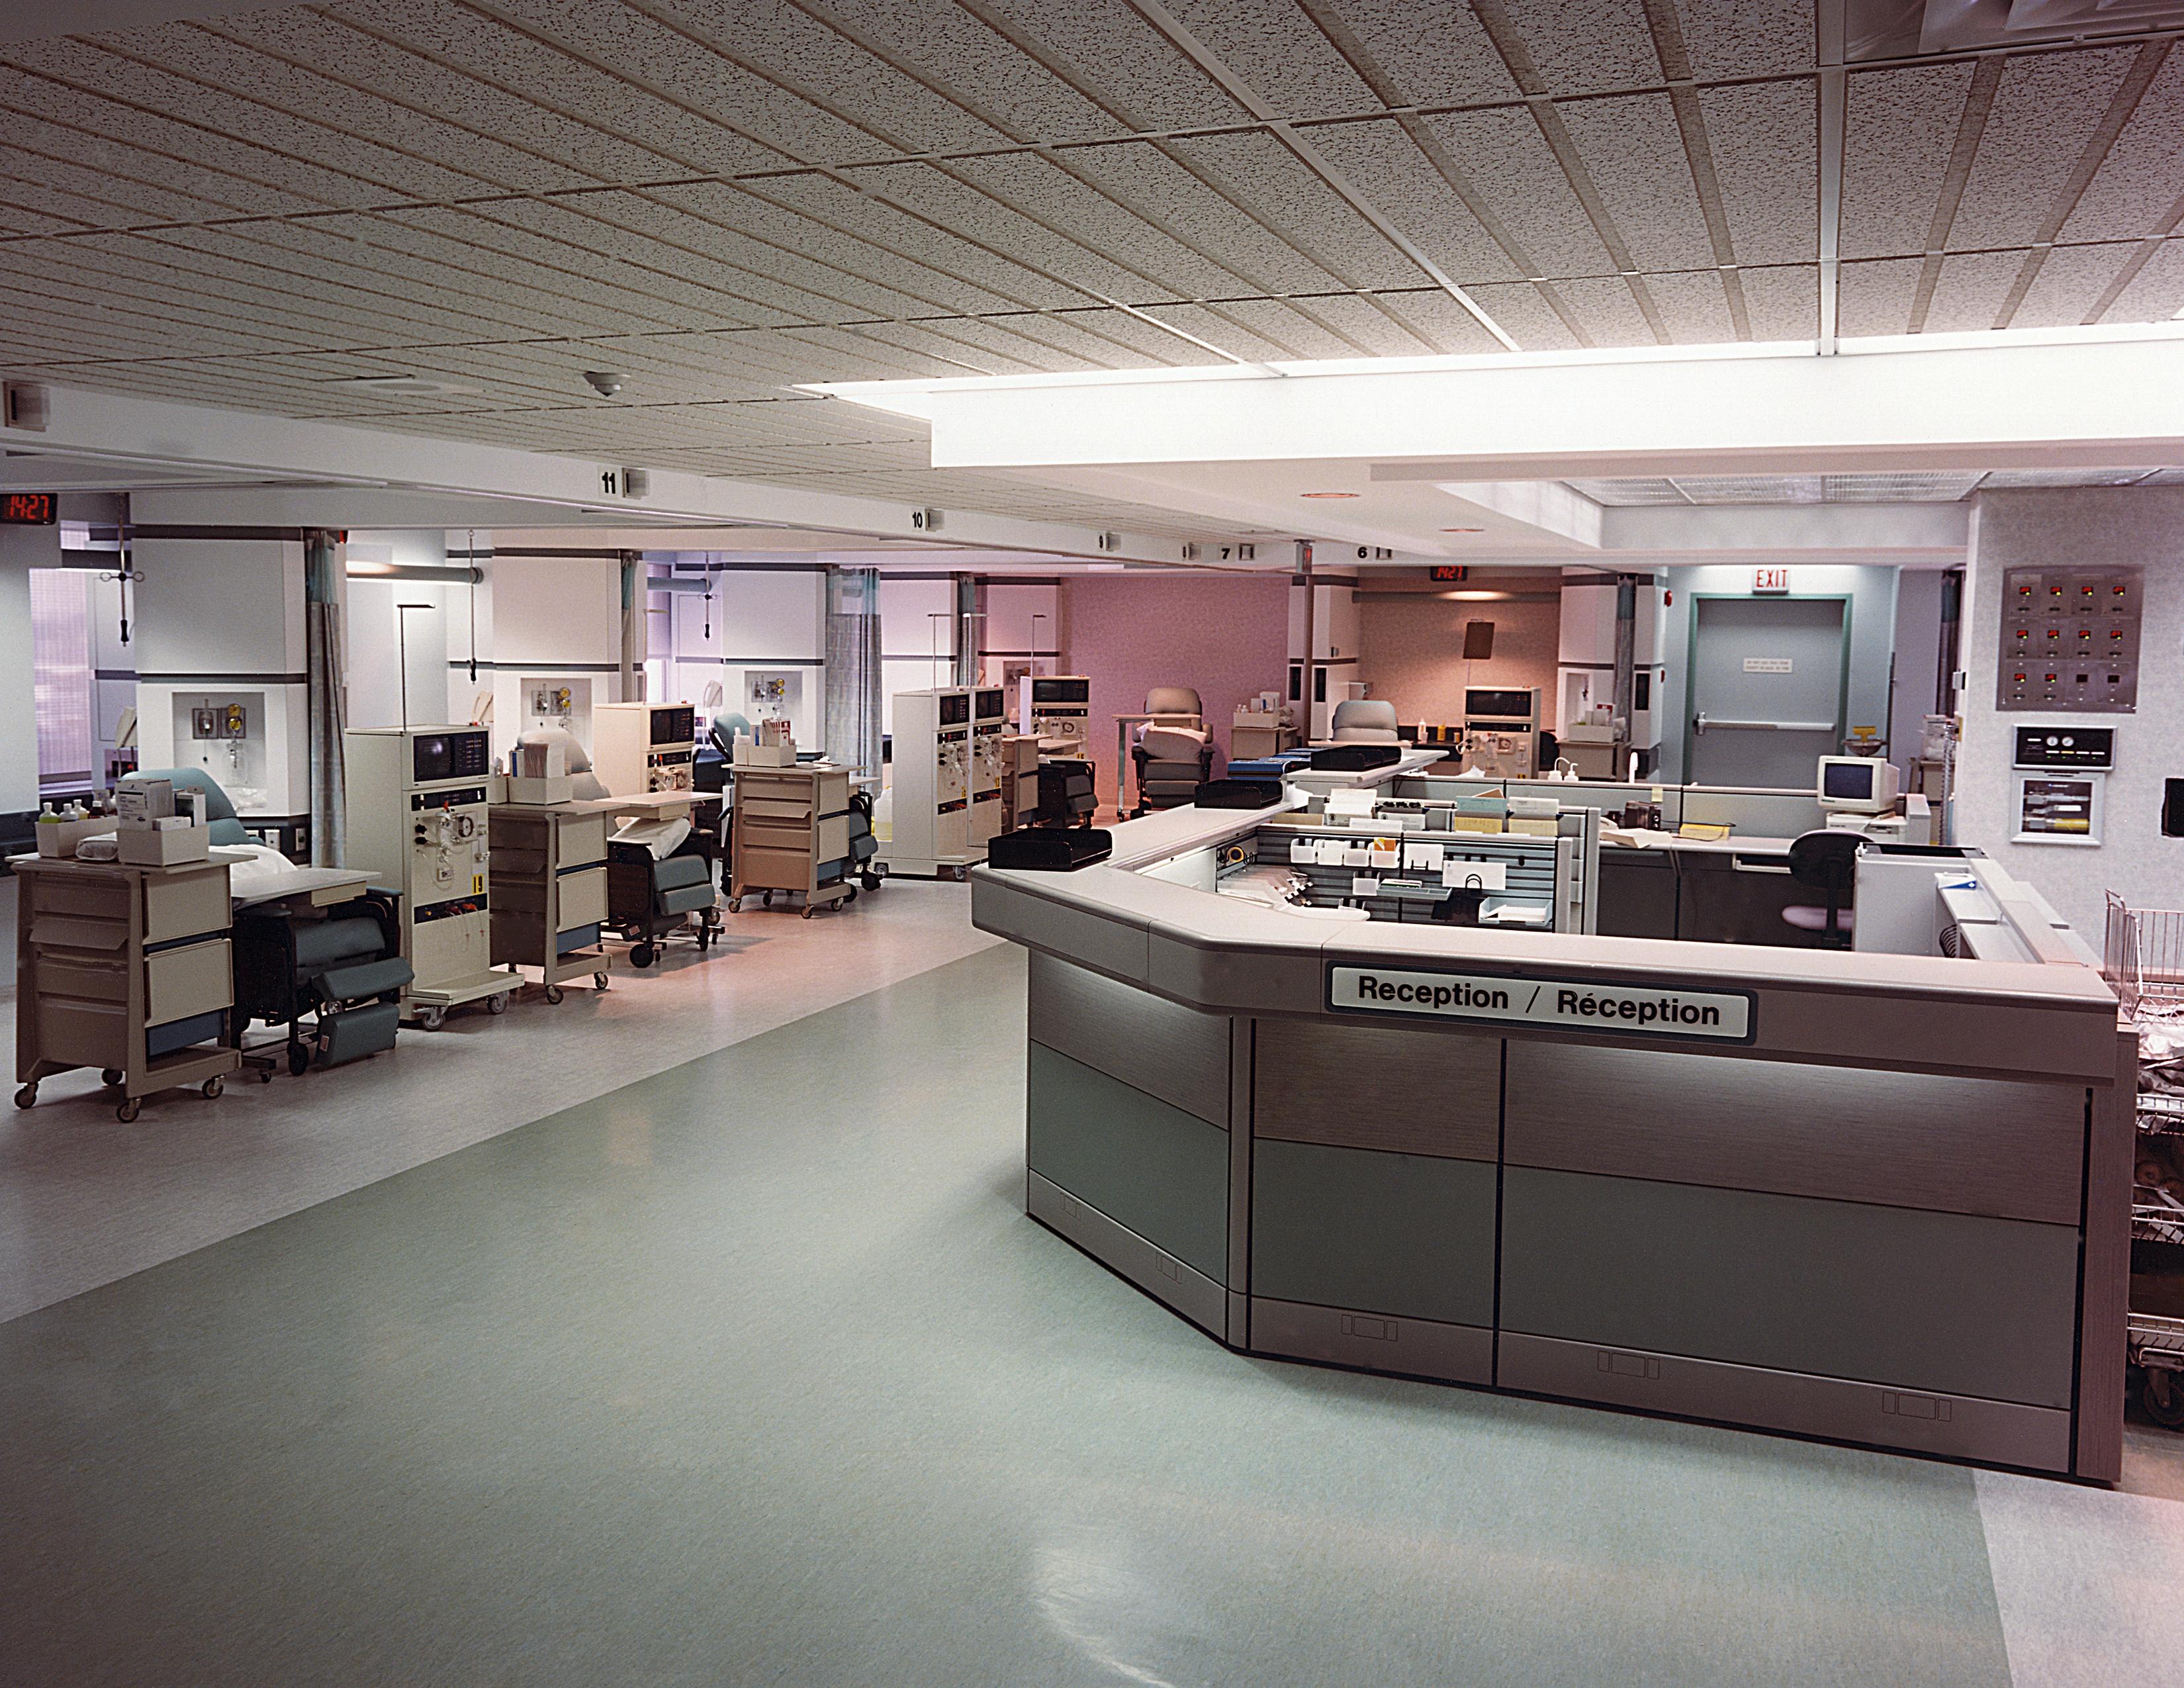 Nurses station at hospital clinic